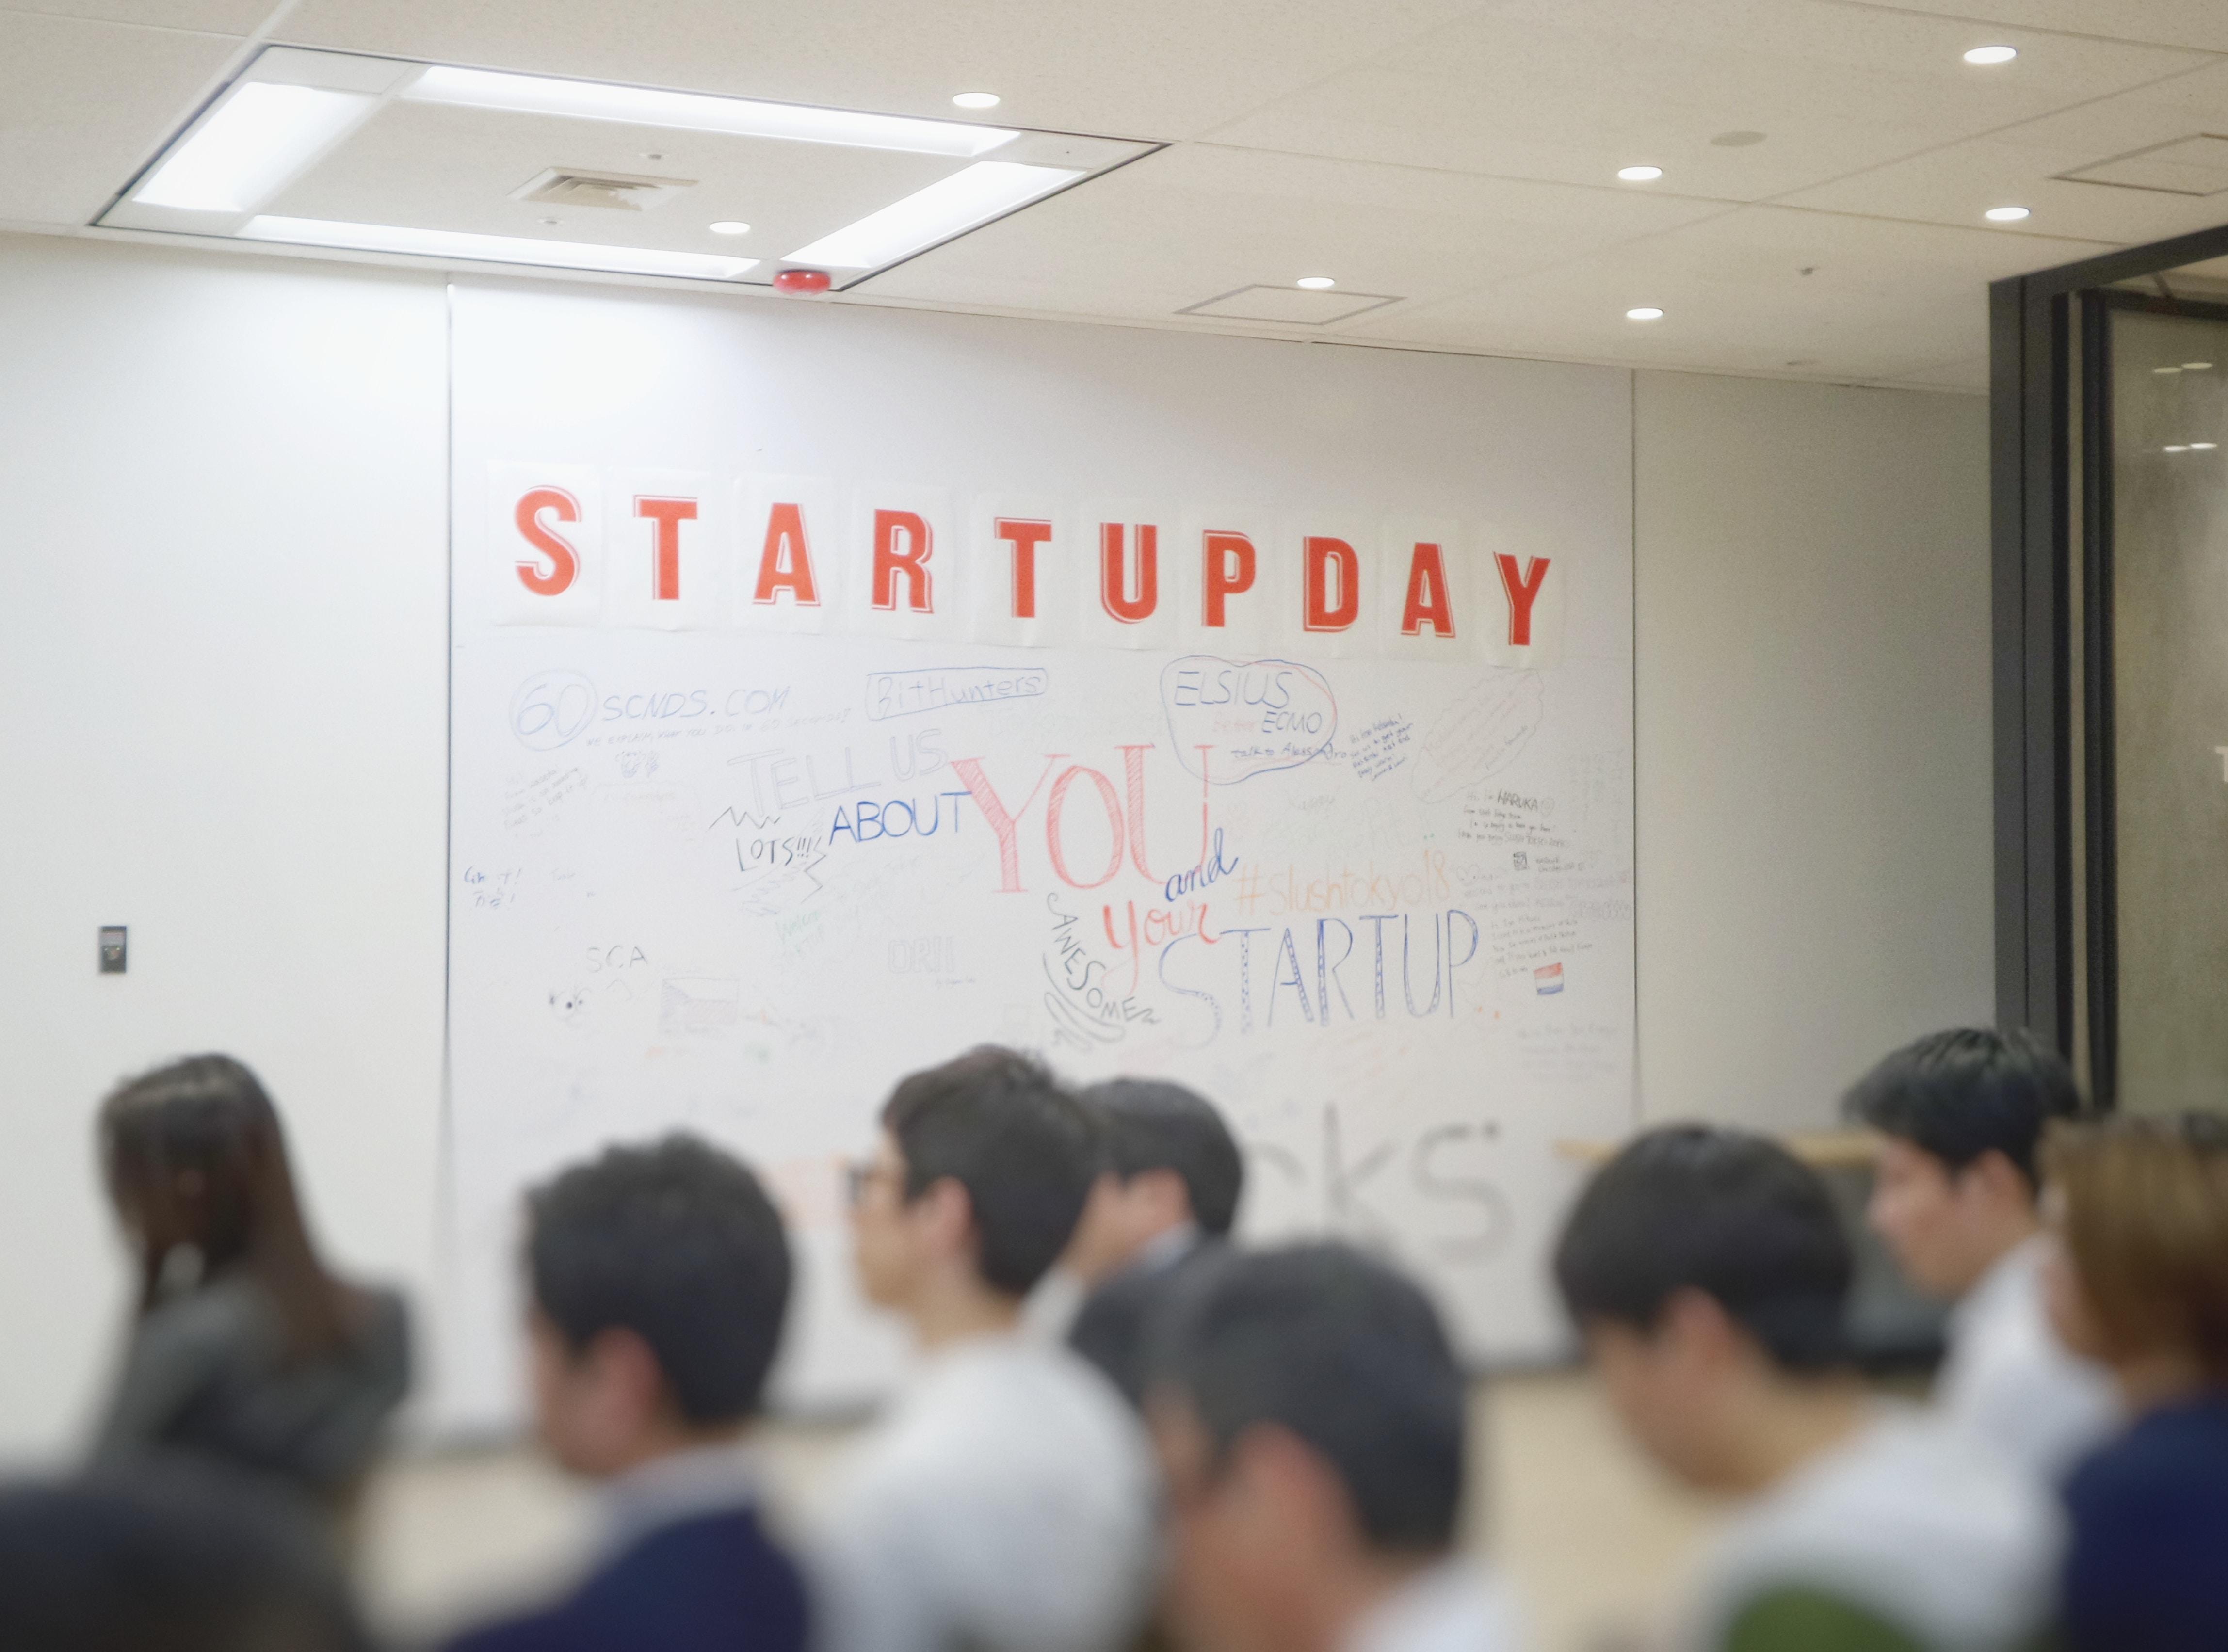 Startup Day. Photo by Franck V. on Unsplash